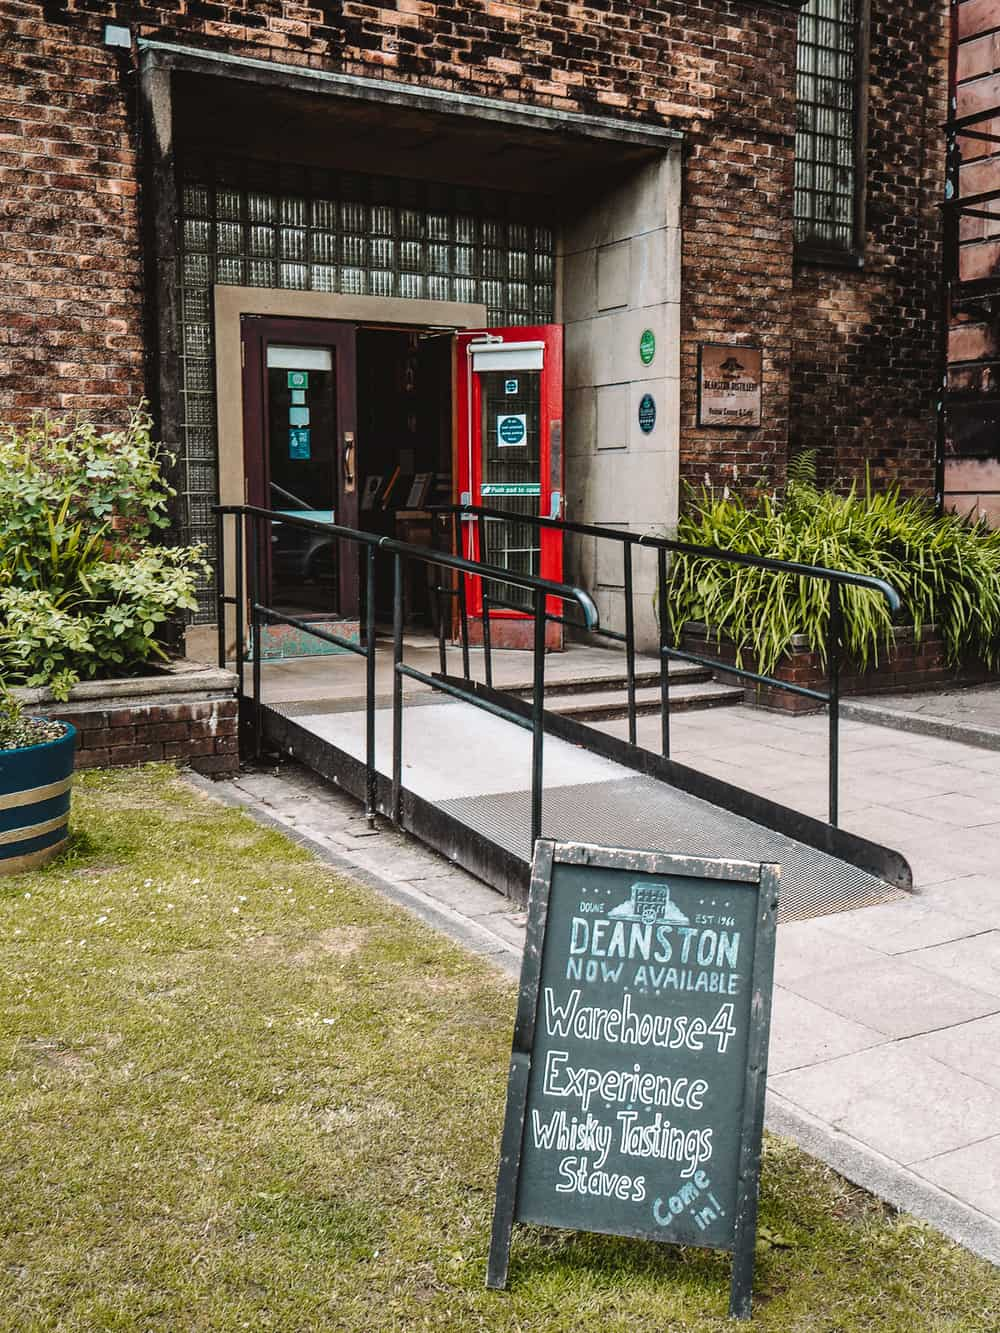 Deanston Distillery tours